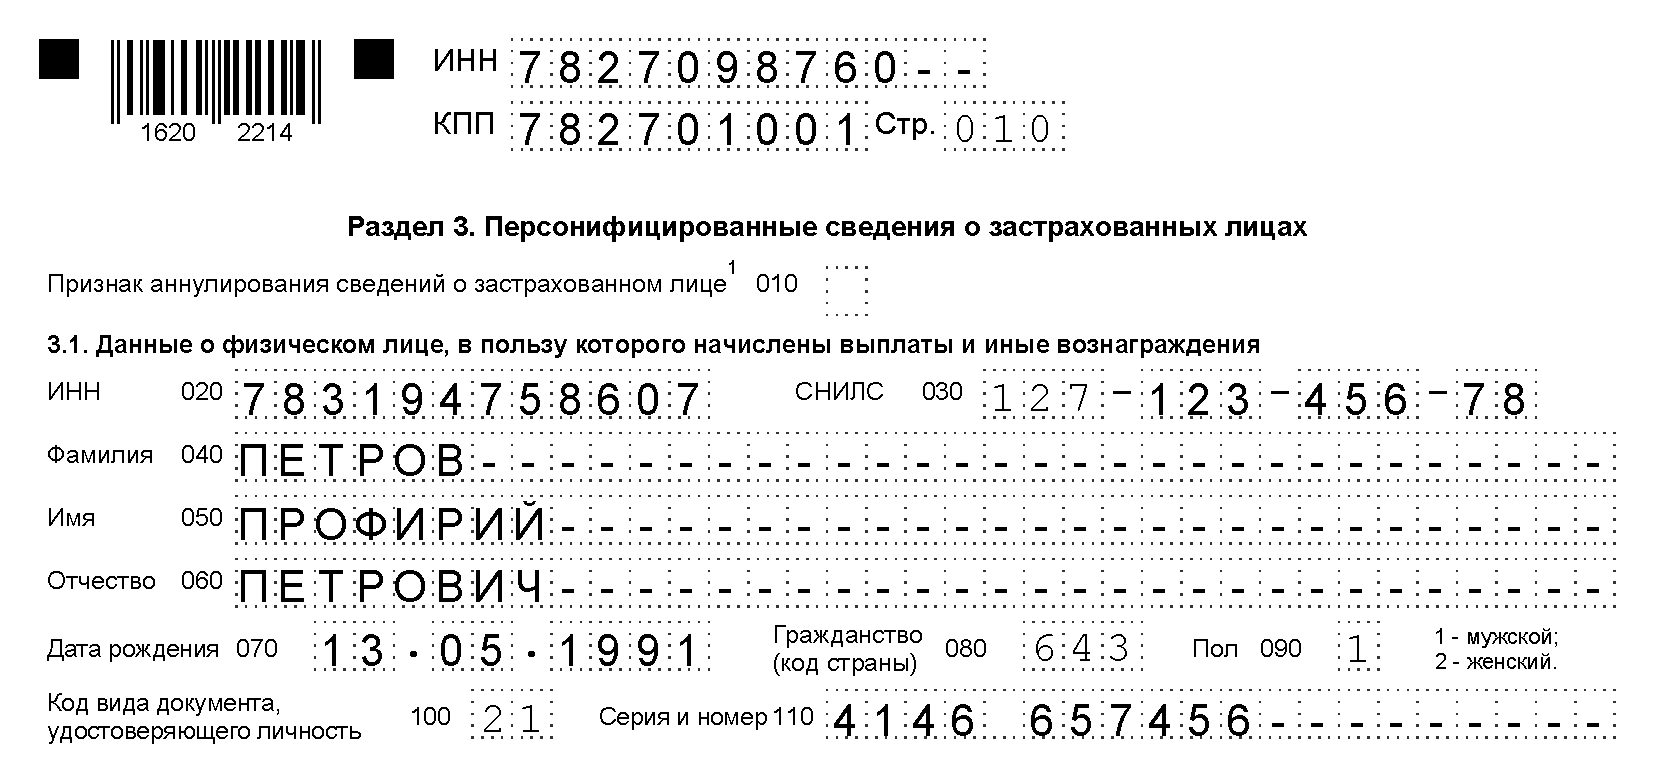 Рсв-1 пфр в 2019 году